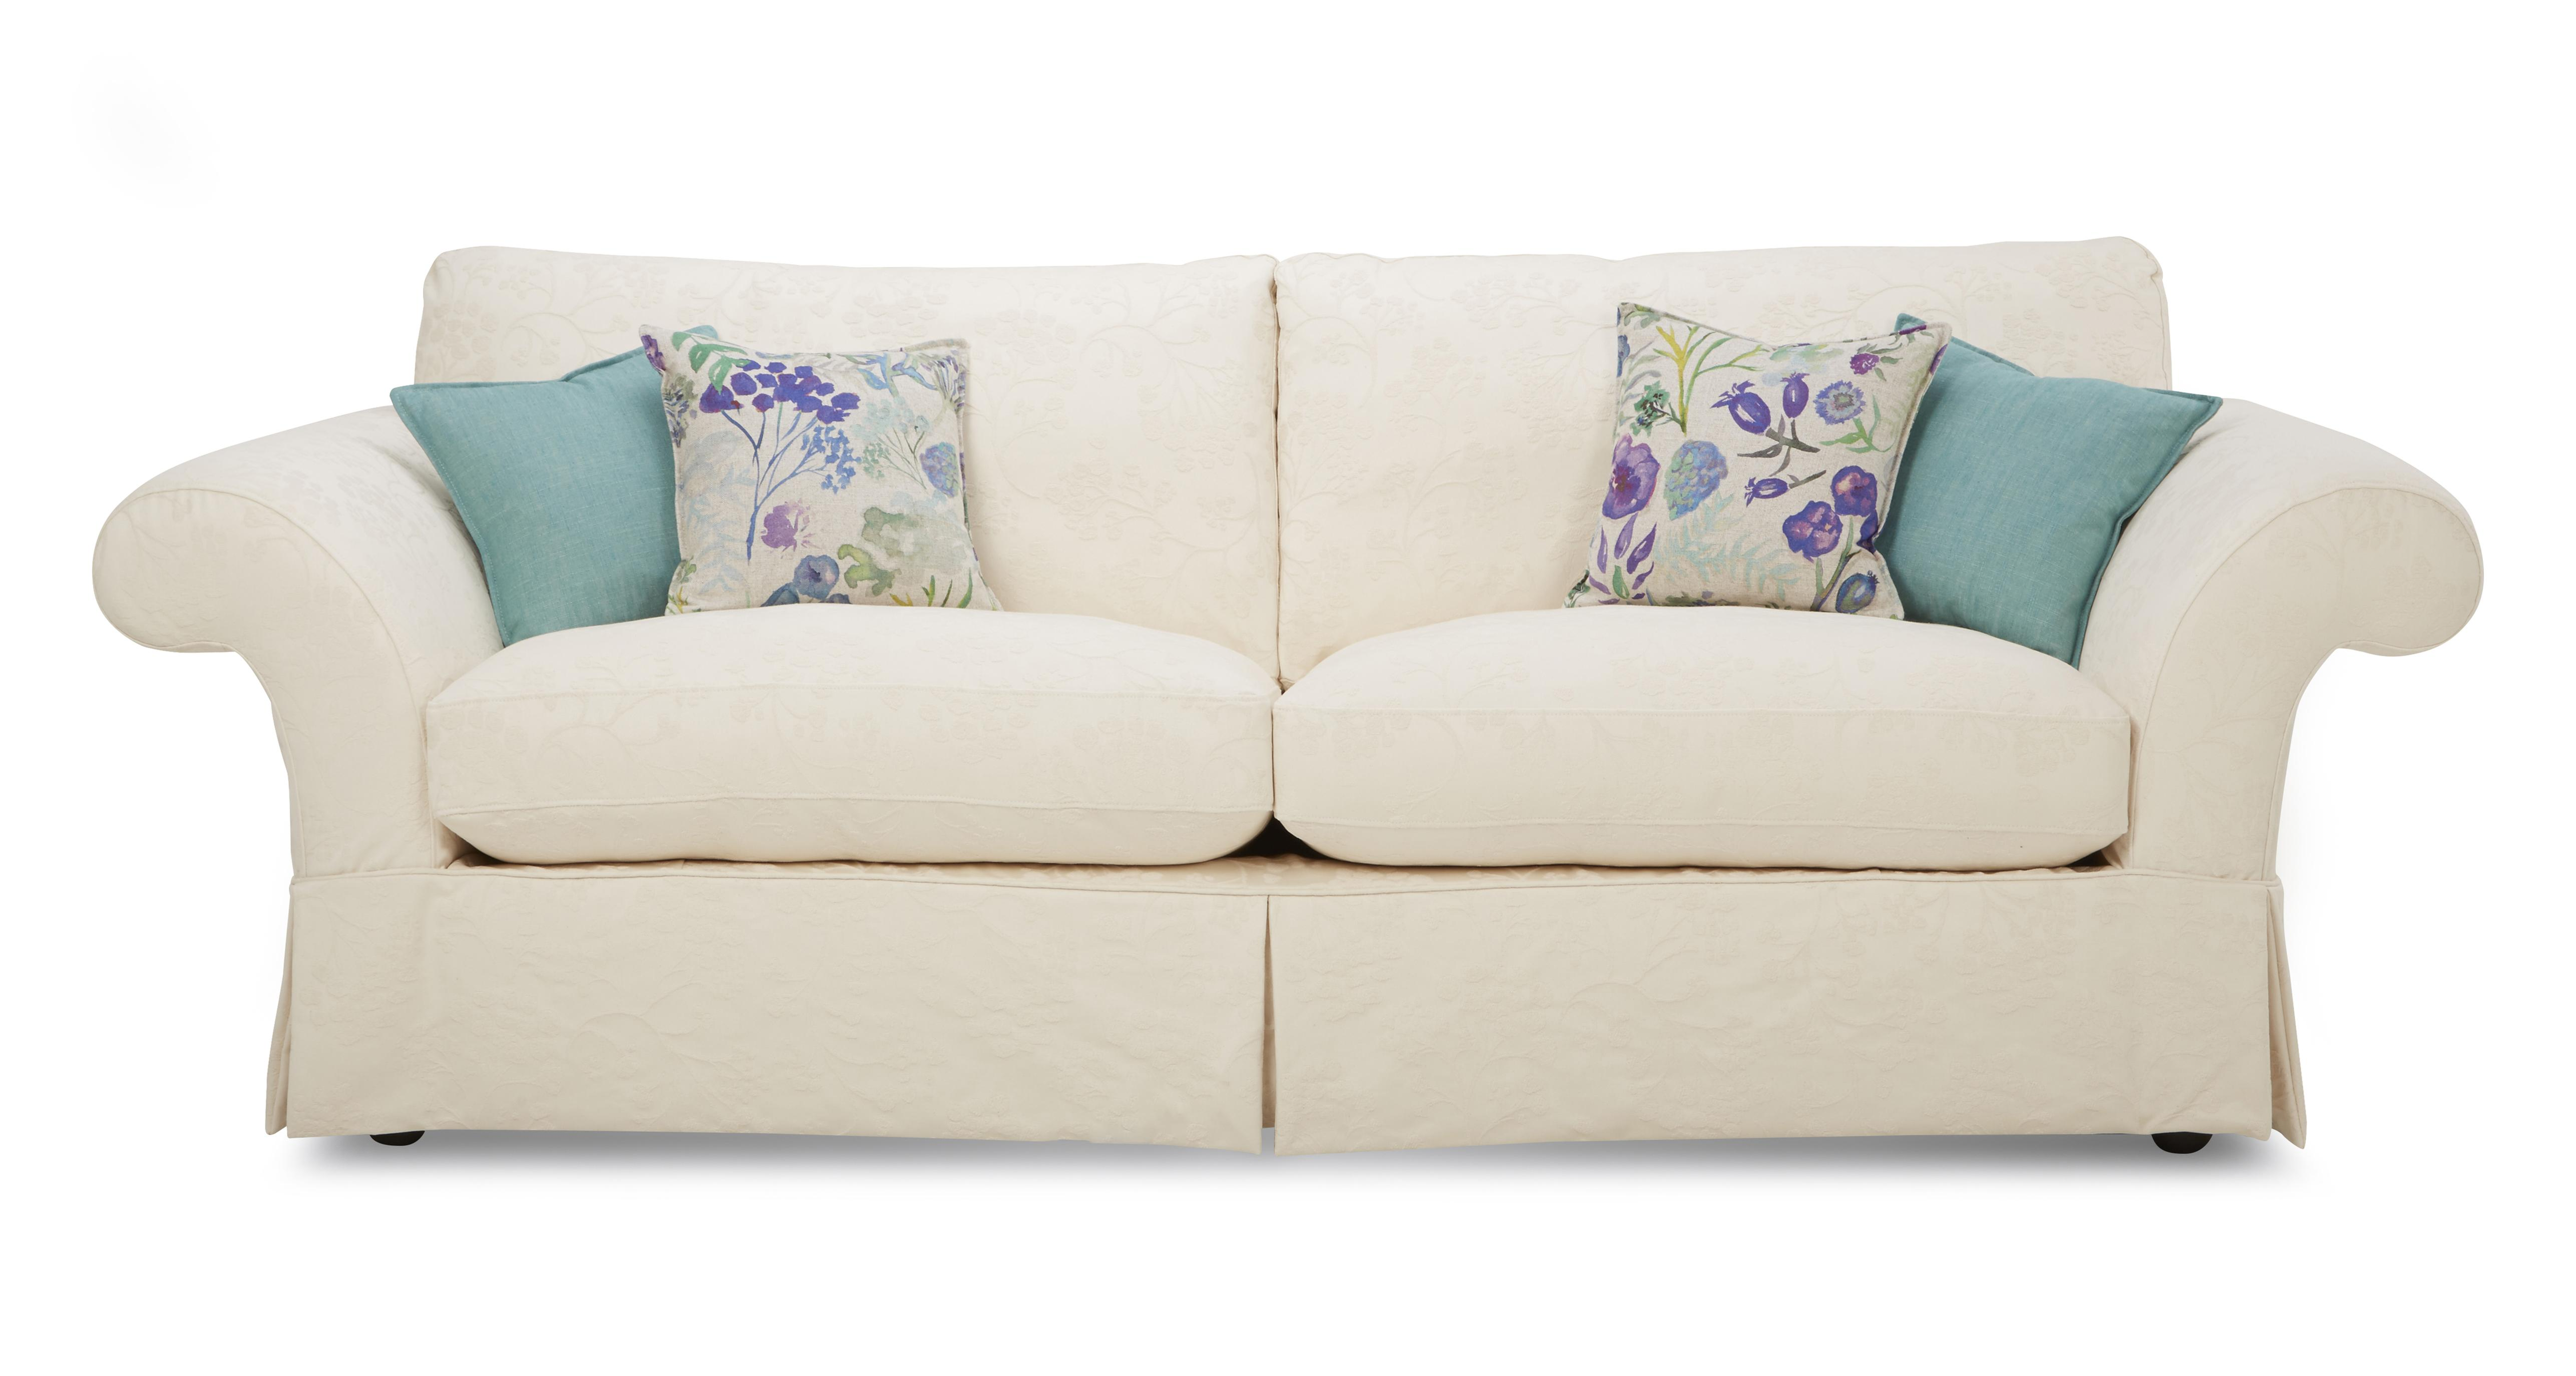 patterned sofas uk outdoor sofa cushions perth malvern pattern grand dfs ireland